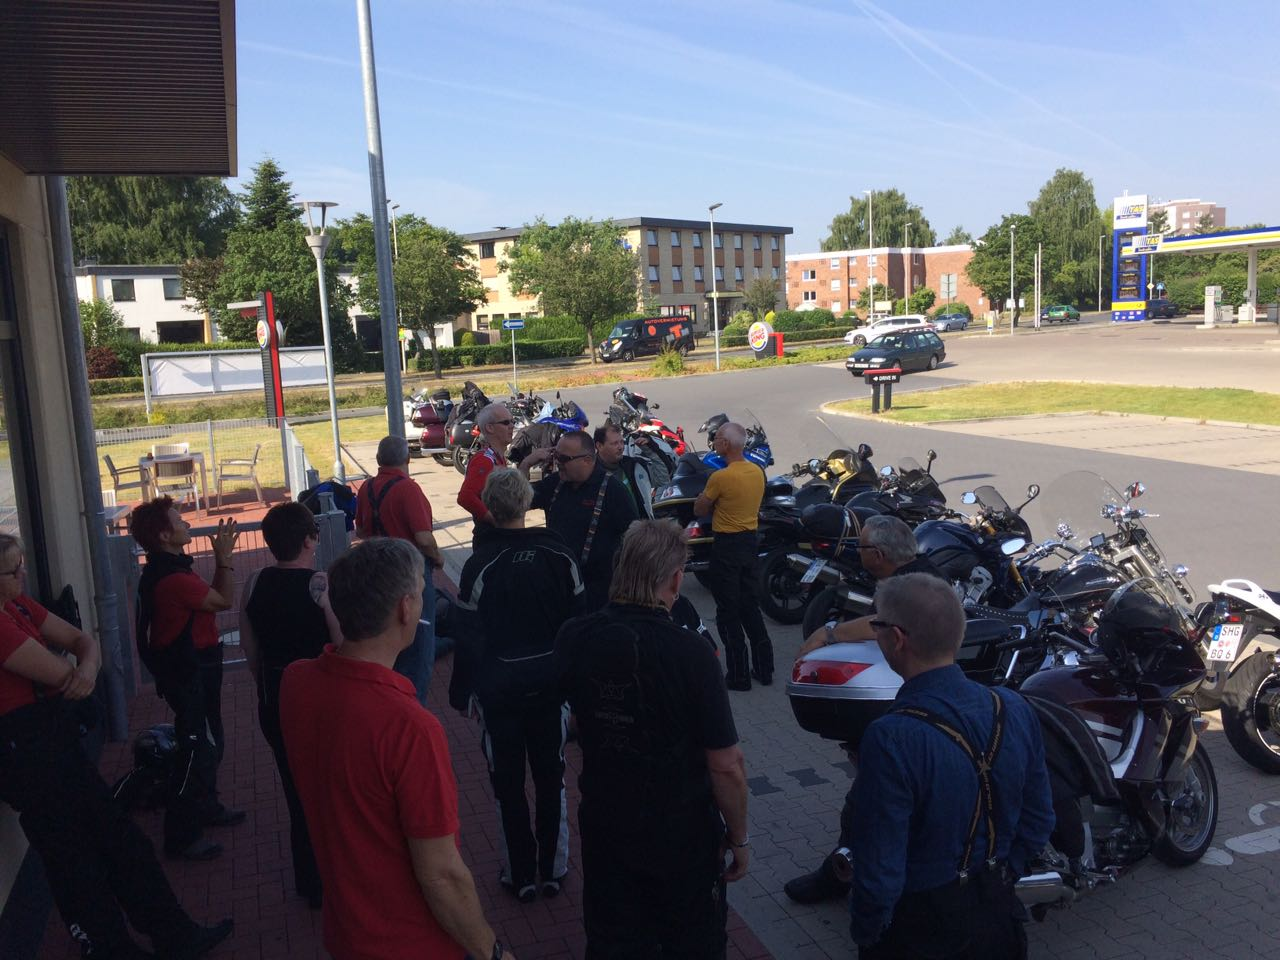 Start 22.06.17 in Wunstorf mit 17 Motorrädern